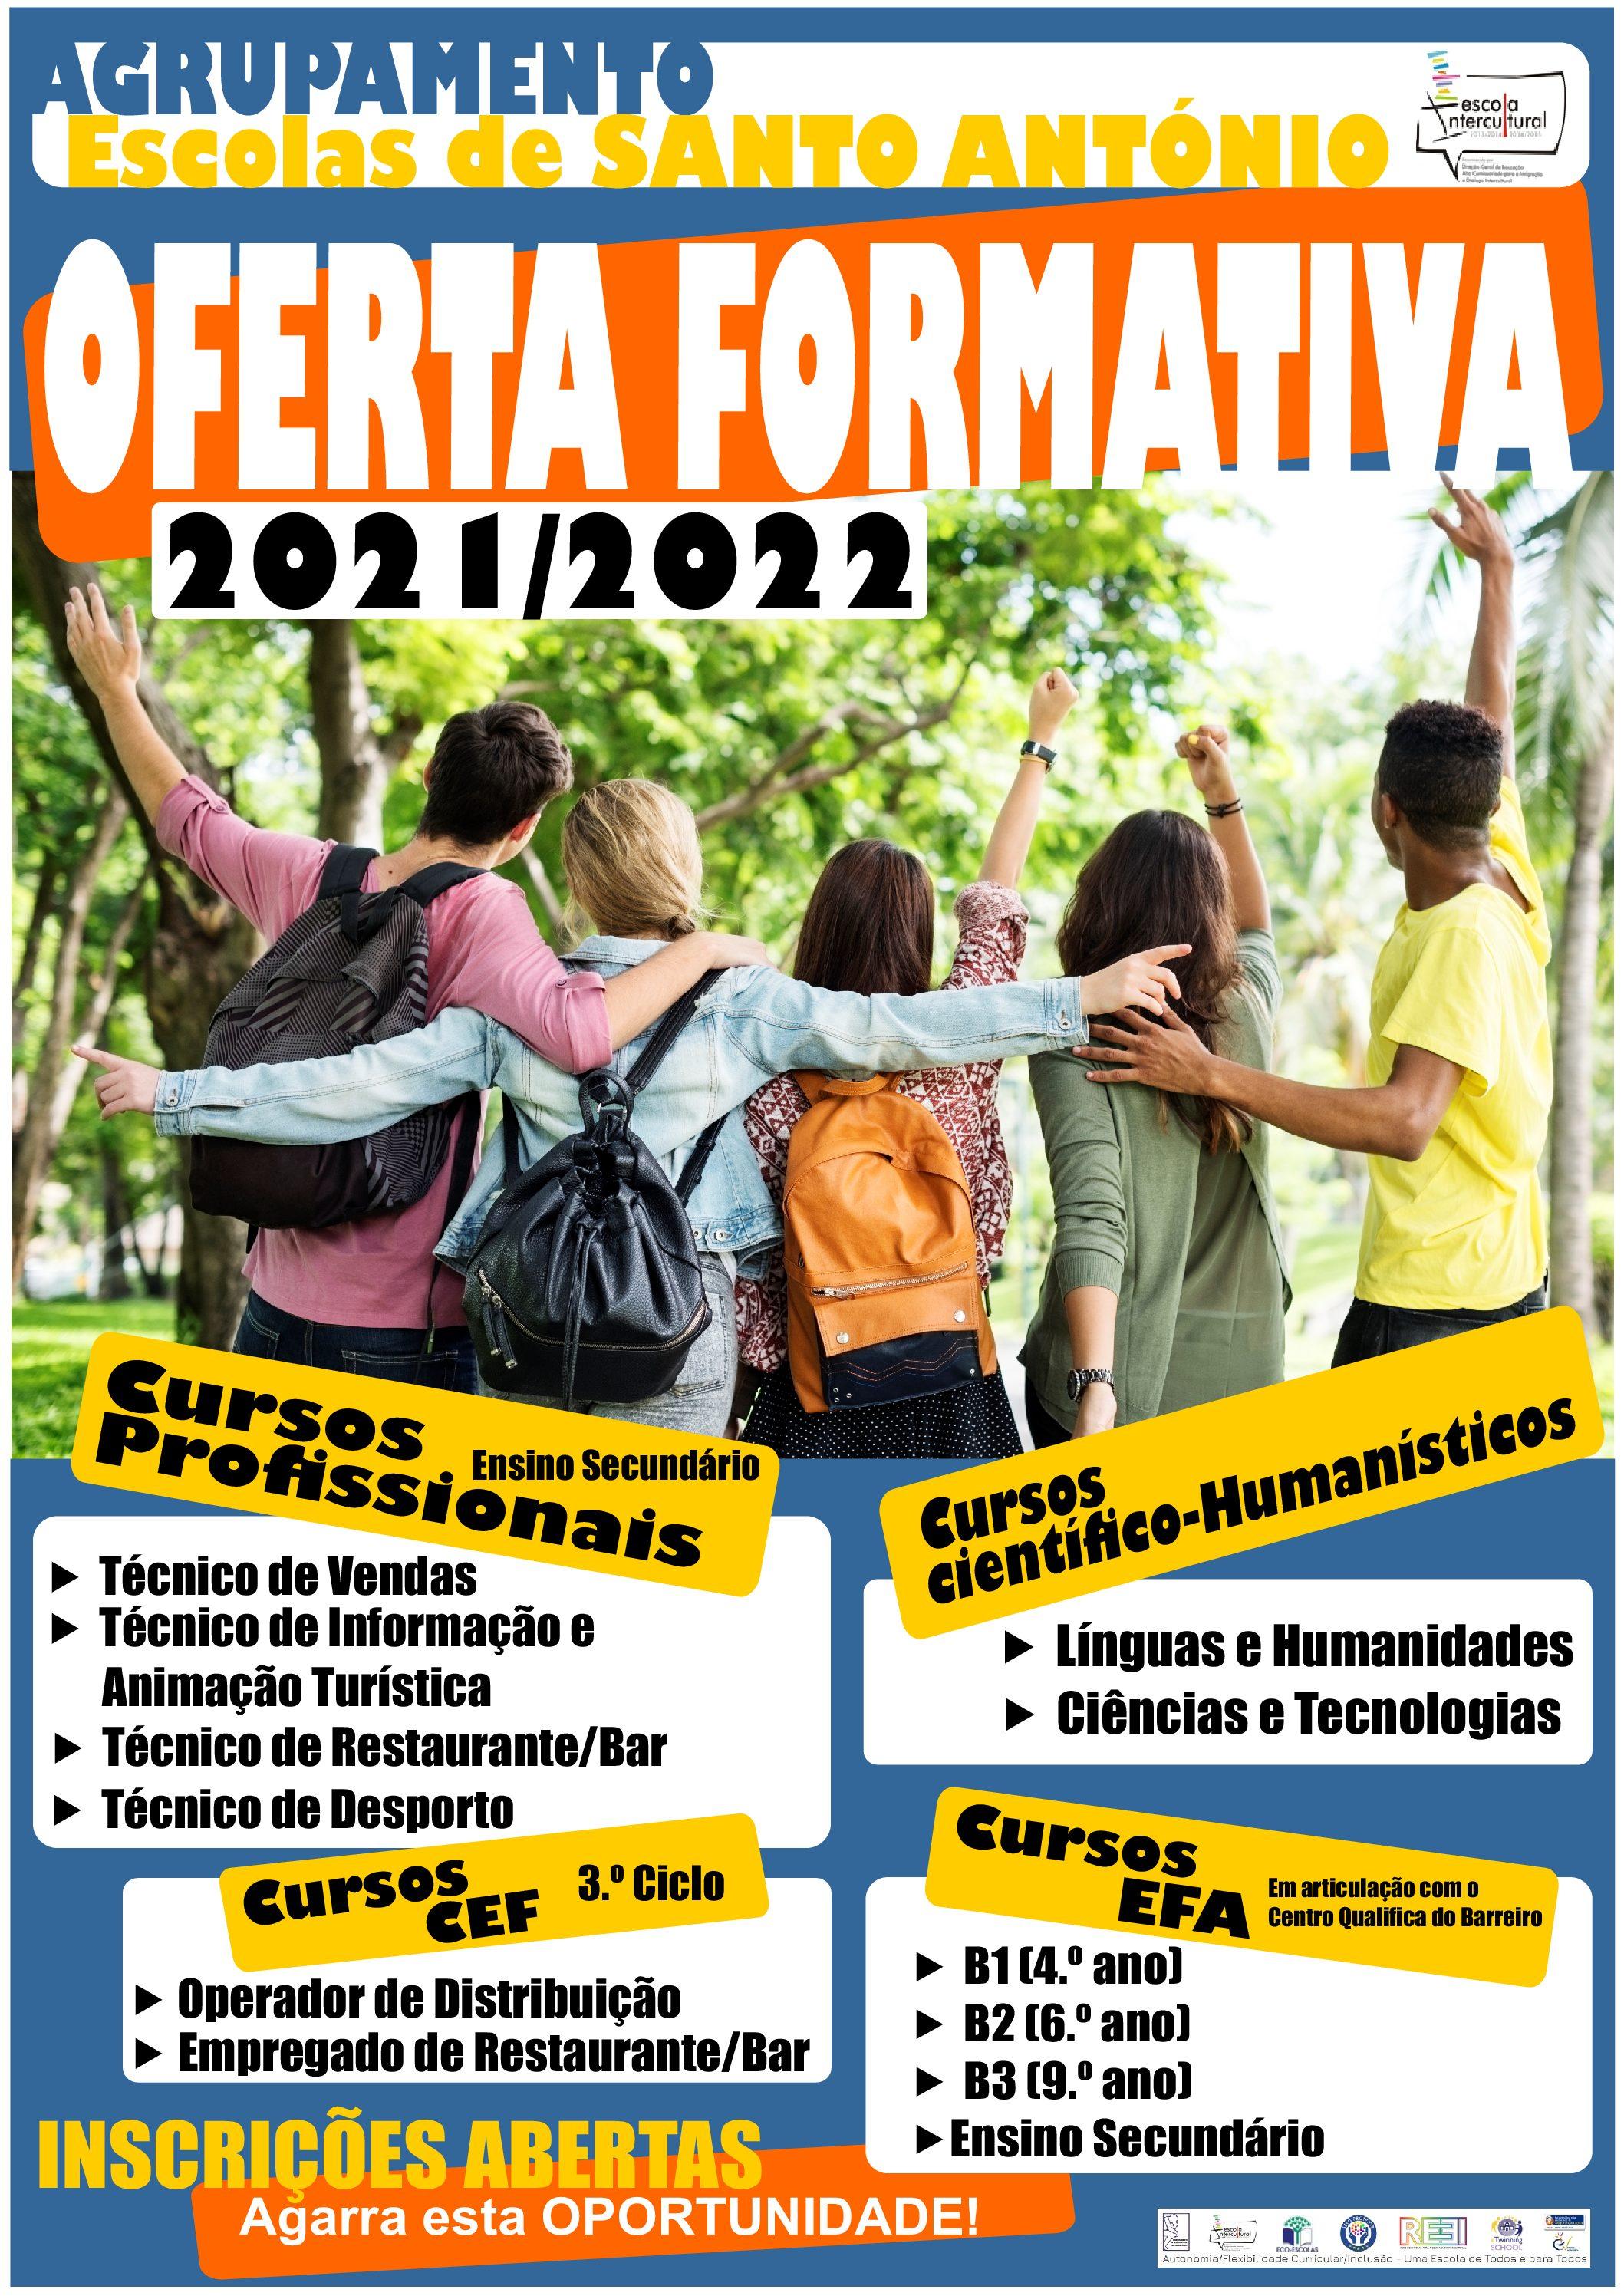 Oferta Formativa 2021/22